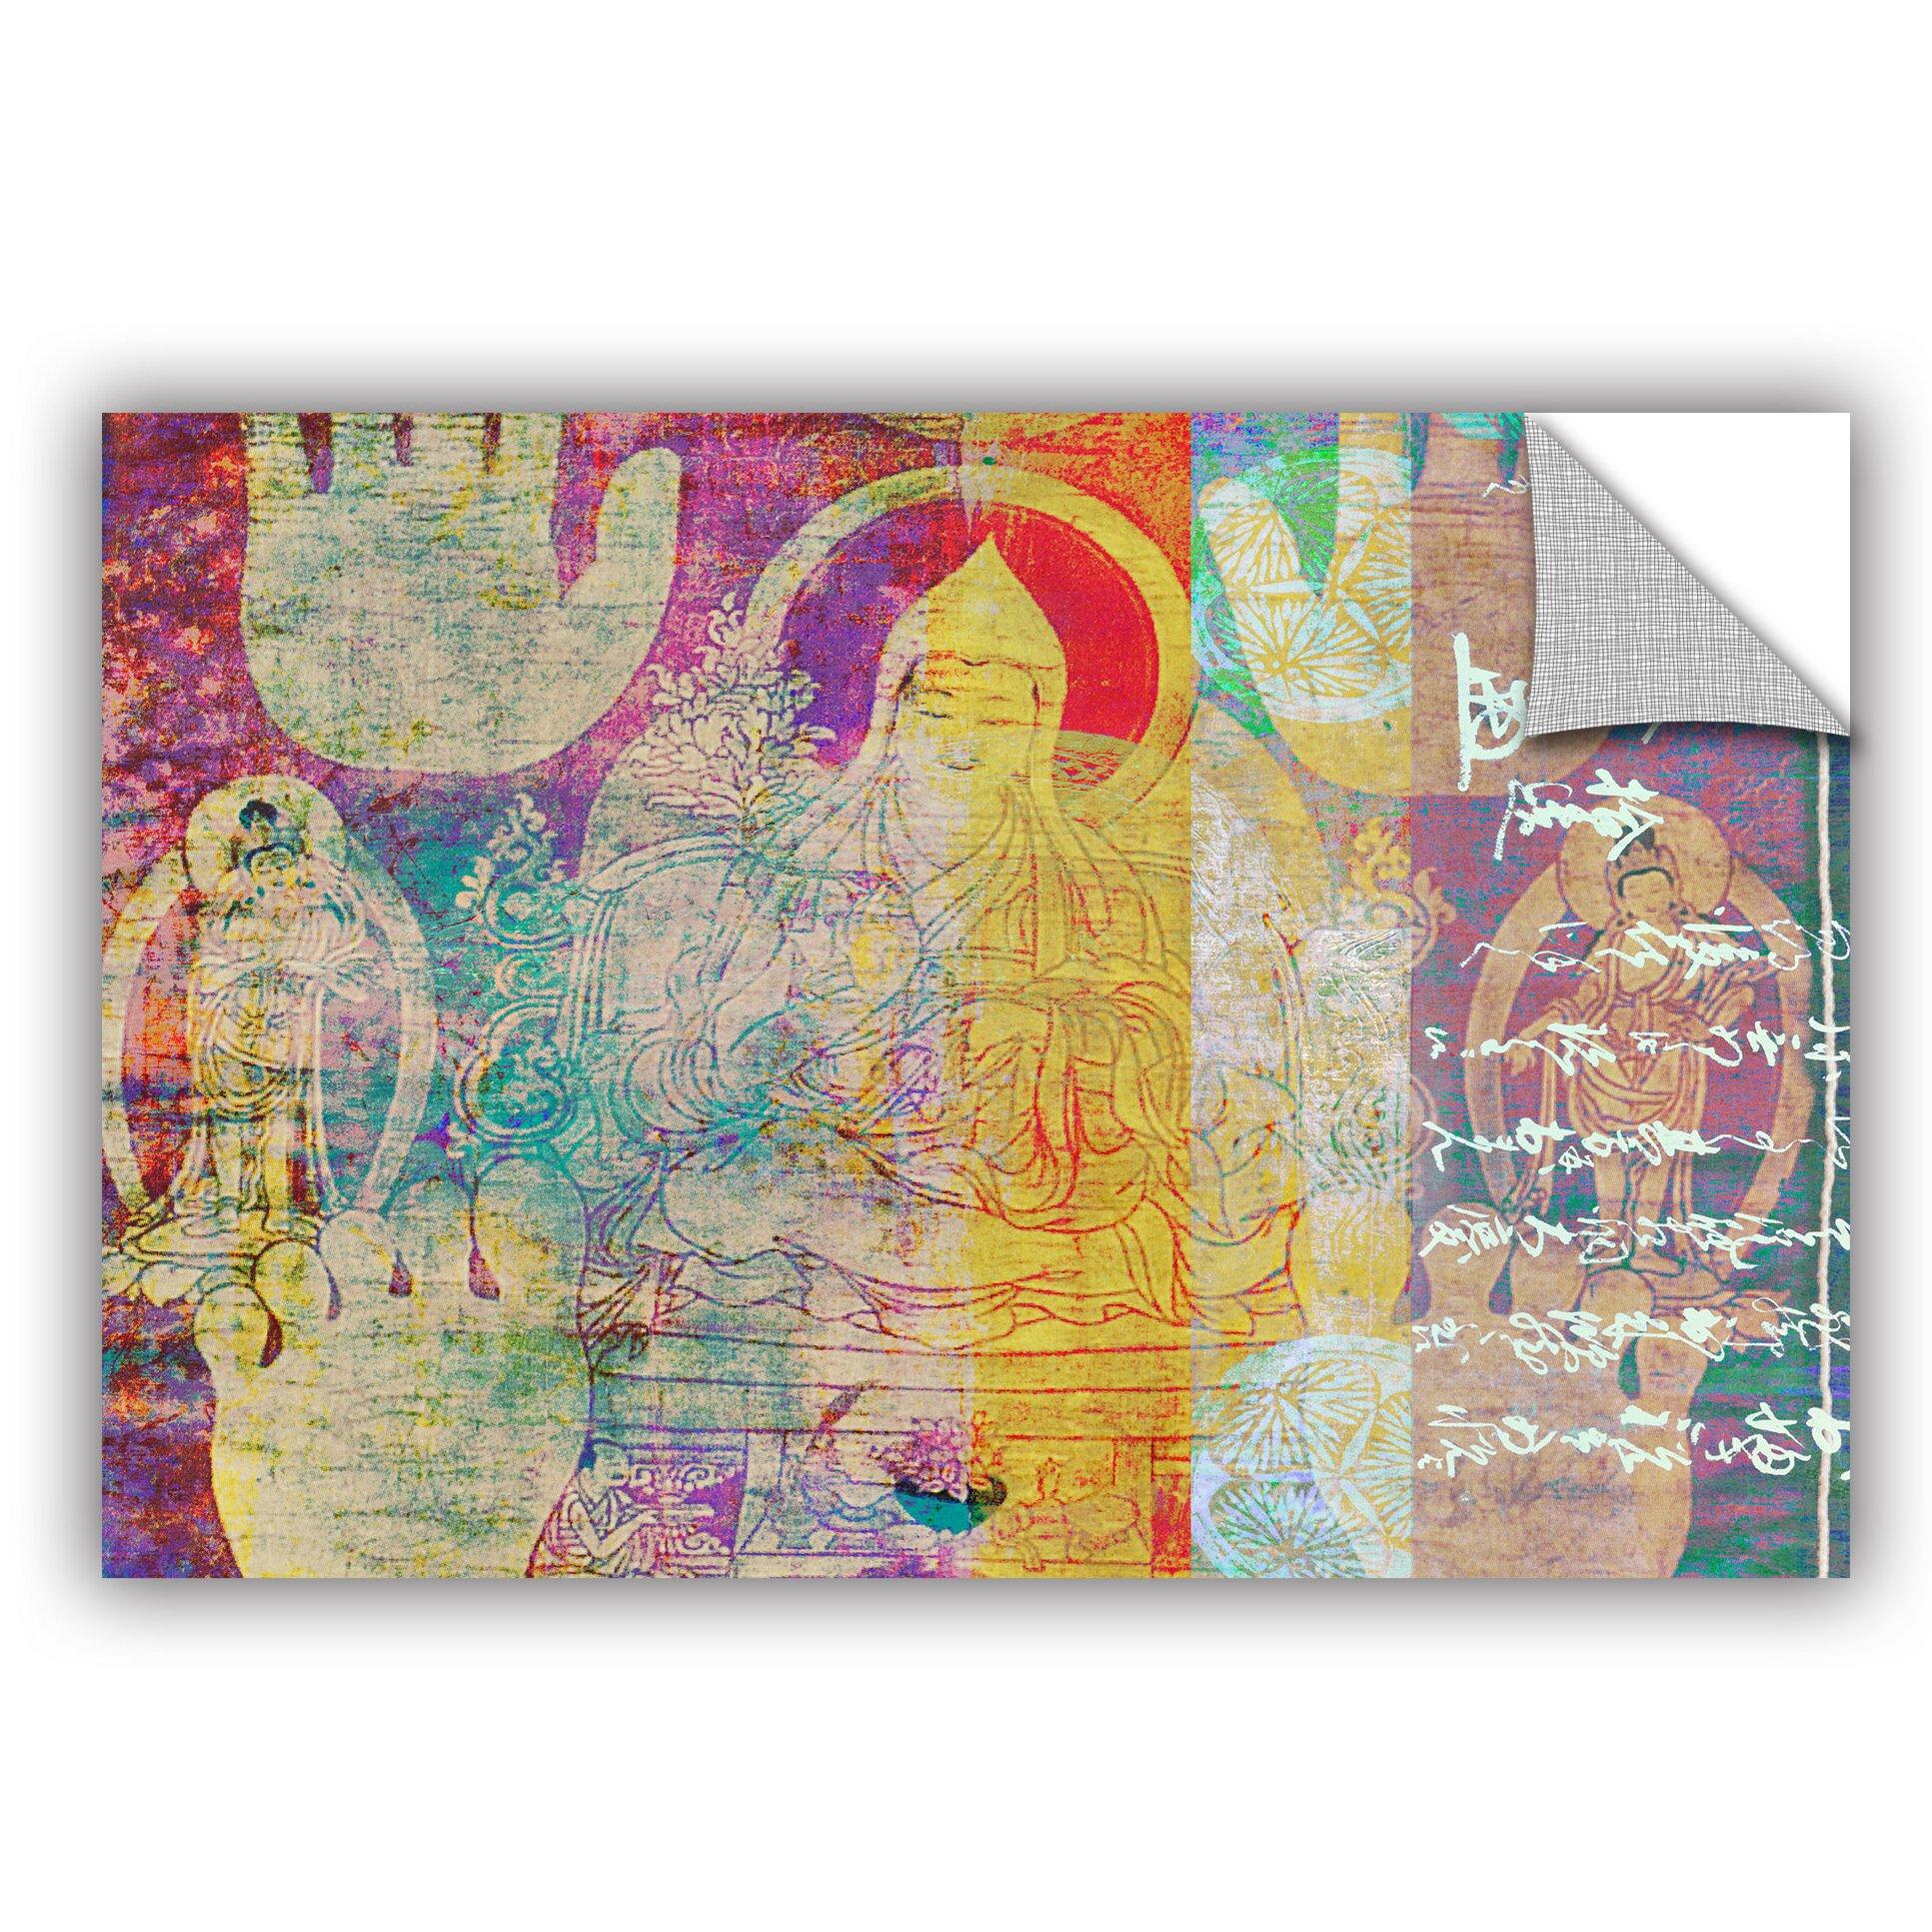 Artwall hi five buddha wall mural wayfair for Buddha wall mural